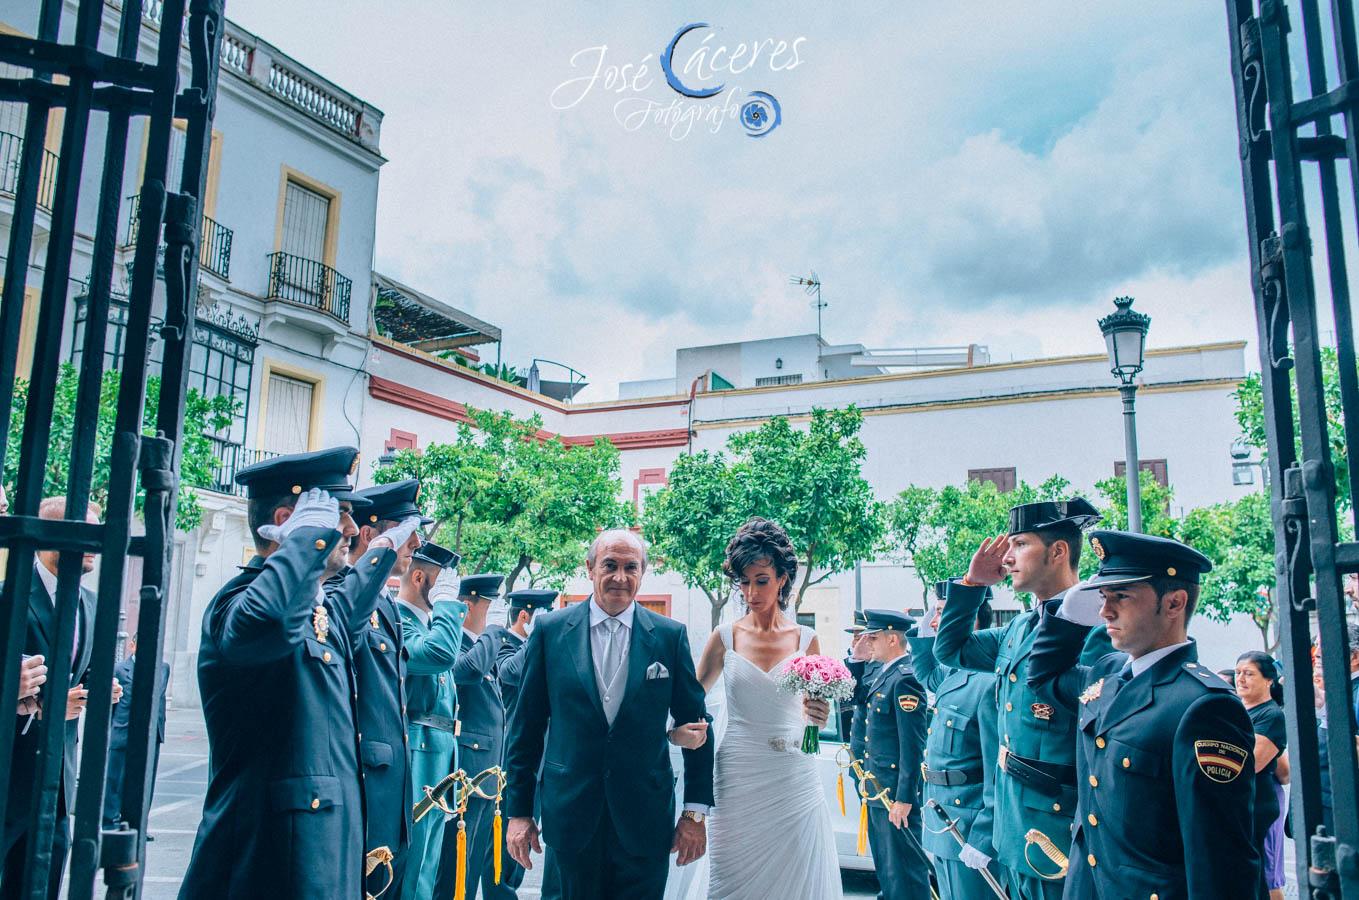 Hotel Palacio Garvey, Iglesia San Miguel, Boda de Ana & Gonzalo, Fotos Jose Caceres-10